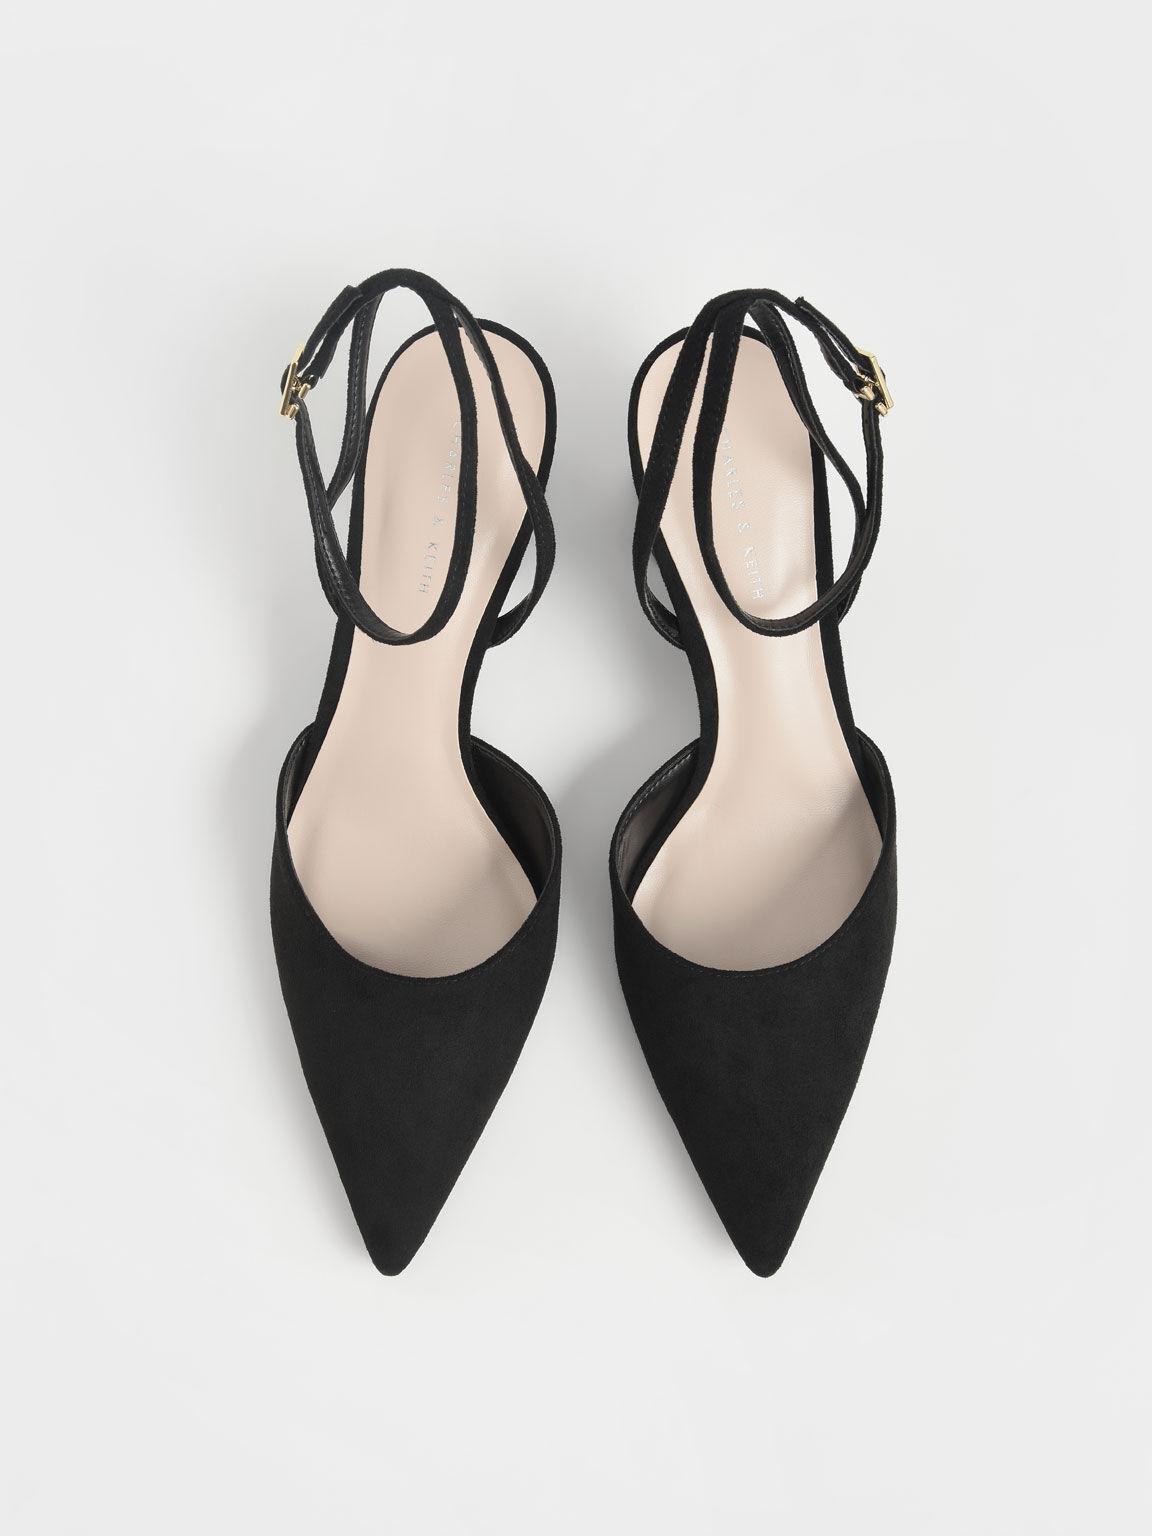 Sepatu Textured Ankle Strap Pointed Toe Pumps, Black, hi-res